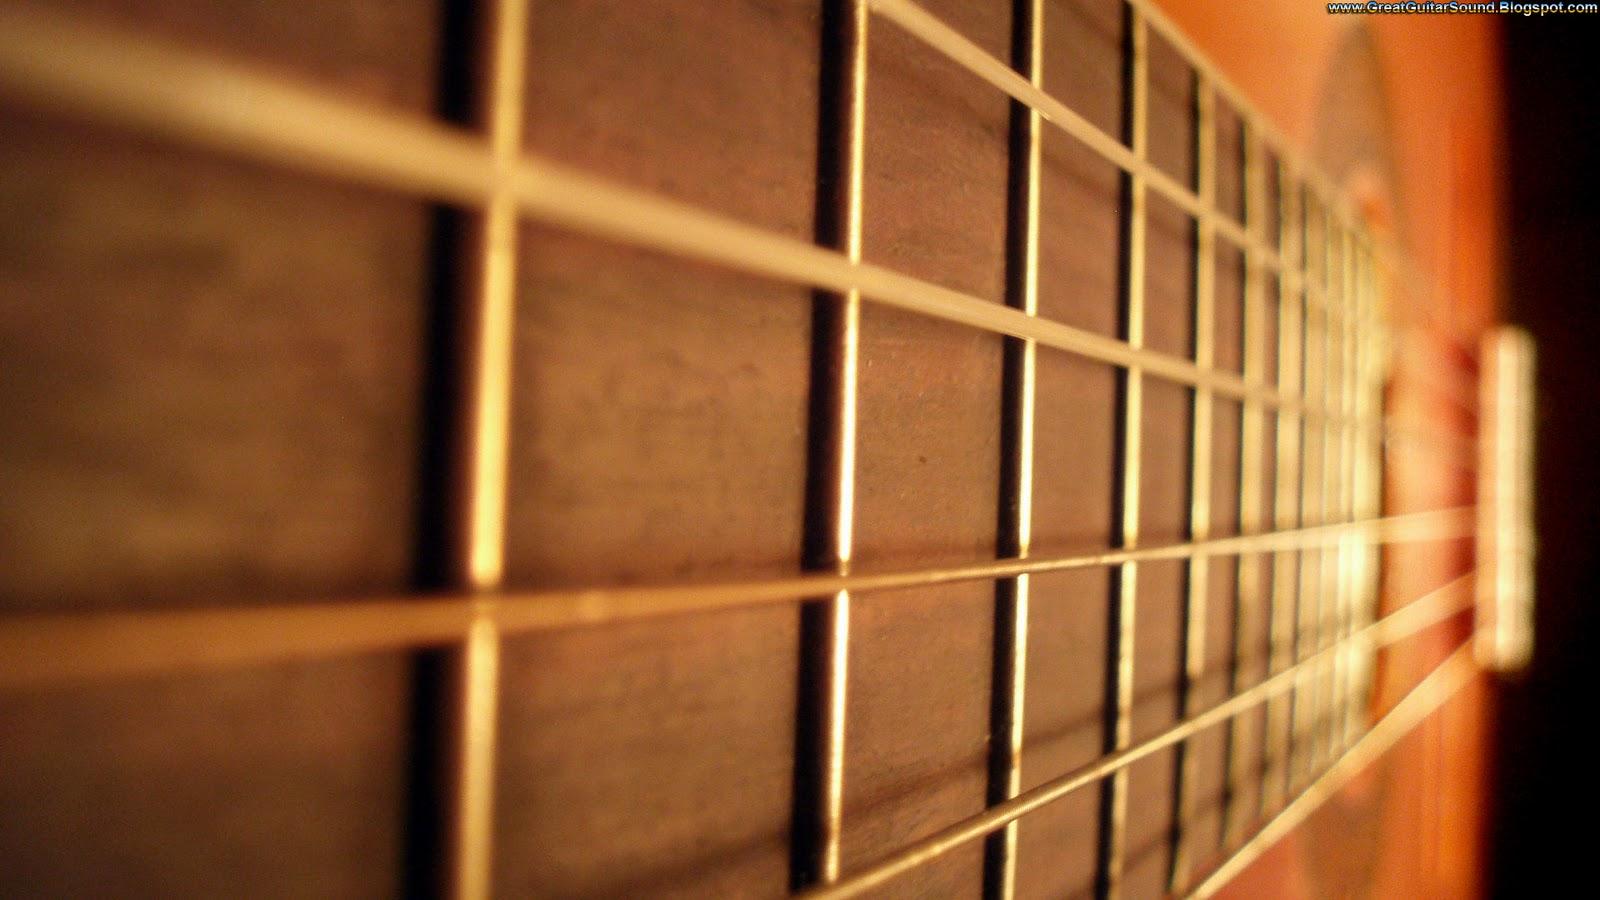 Great Guitar Sound Guitar Wallpaper Landola C 55